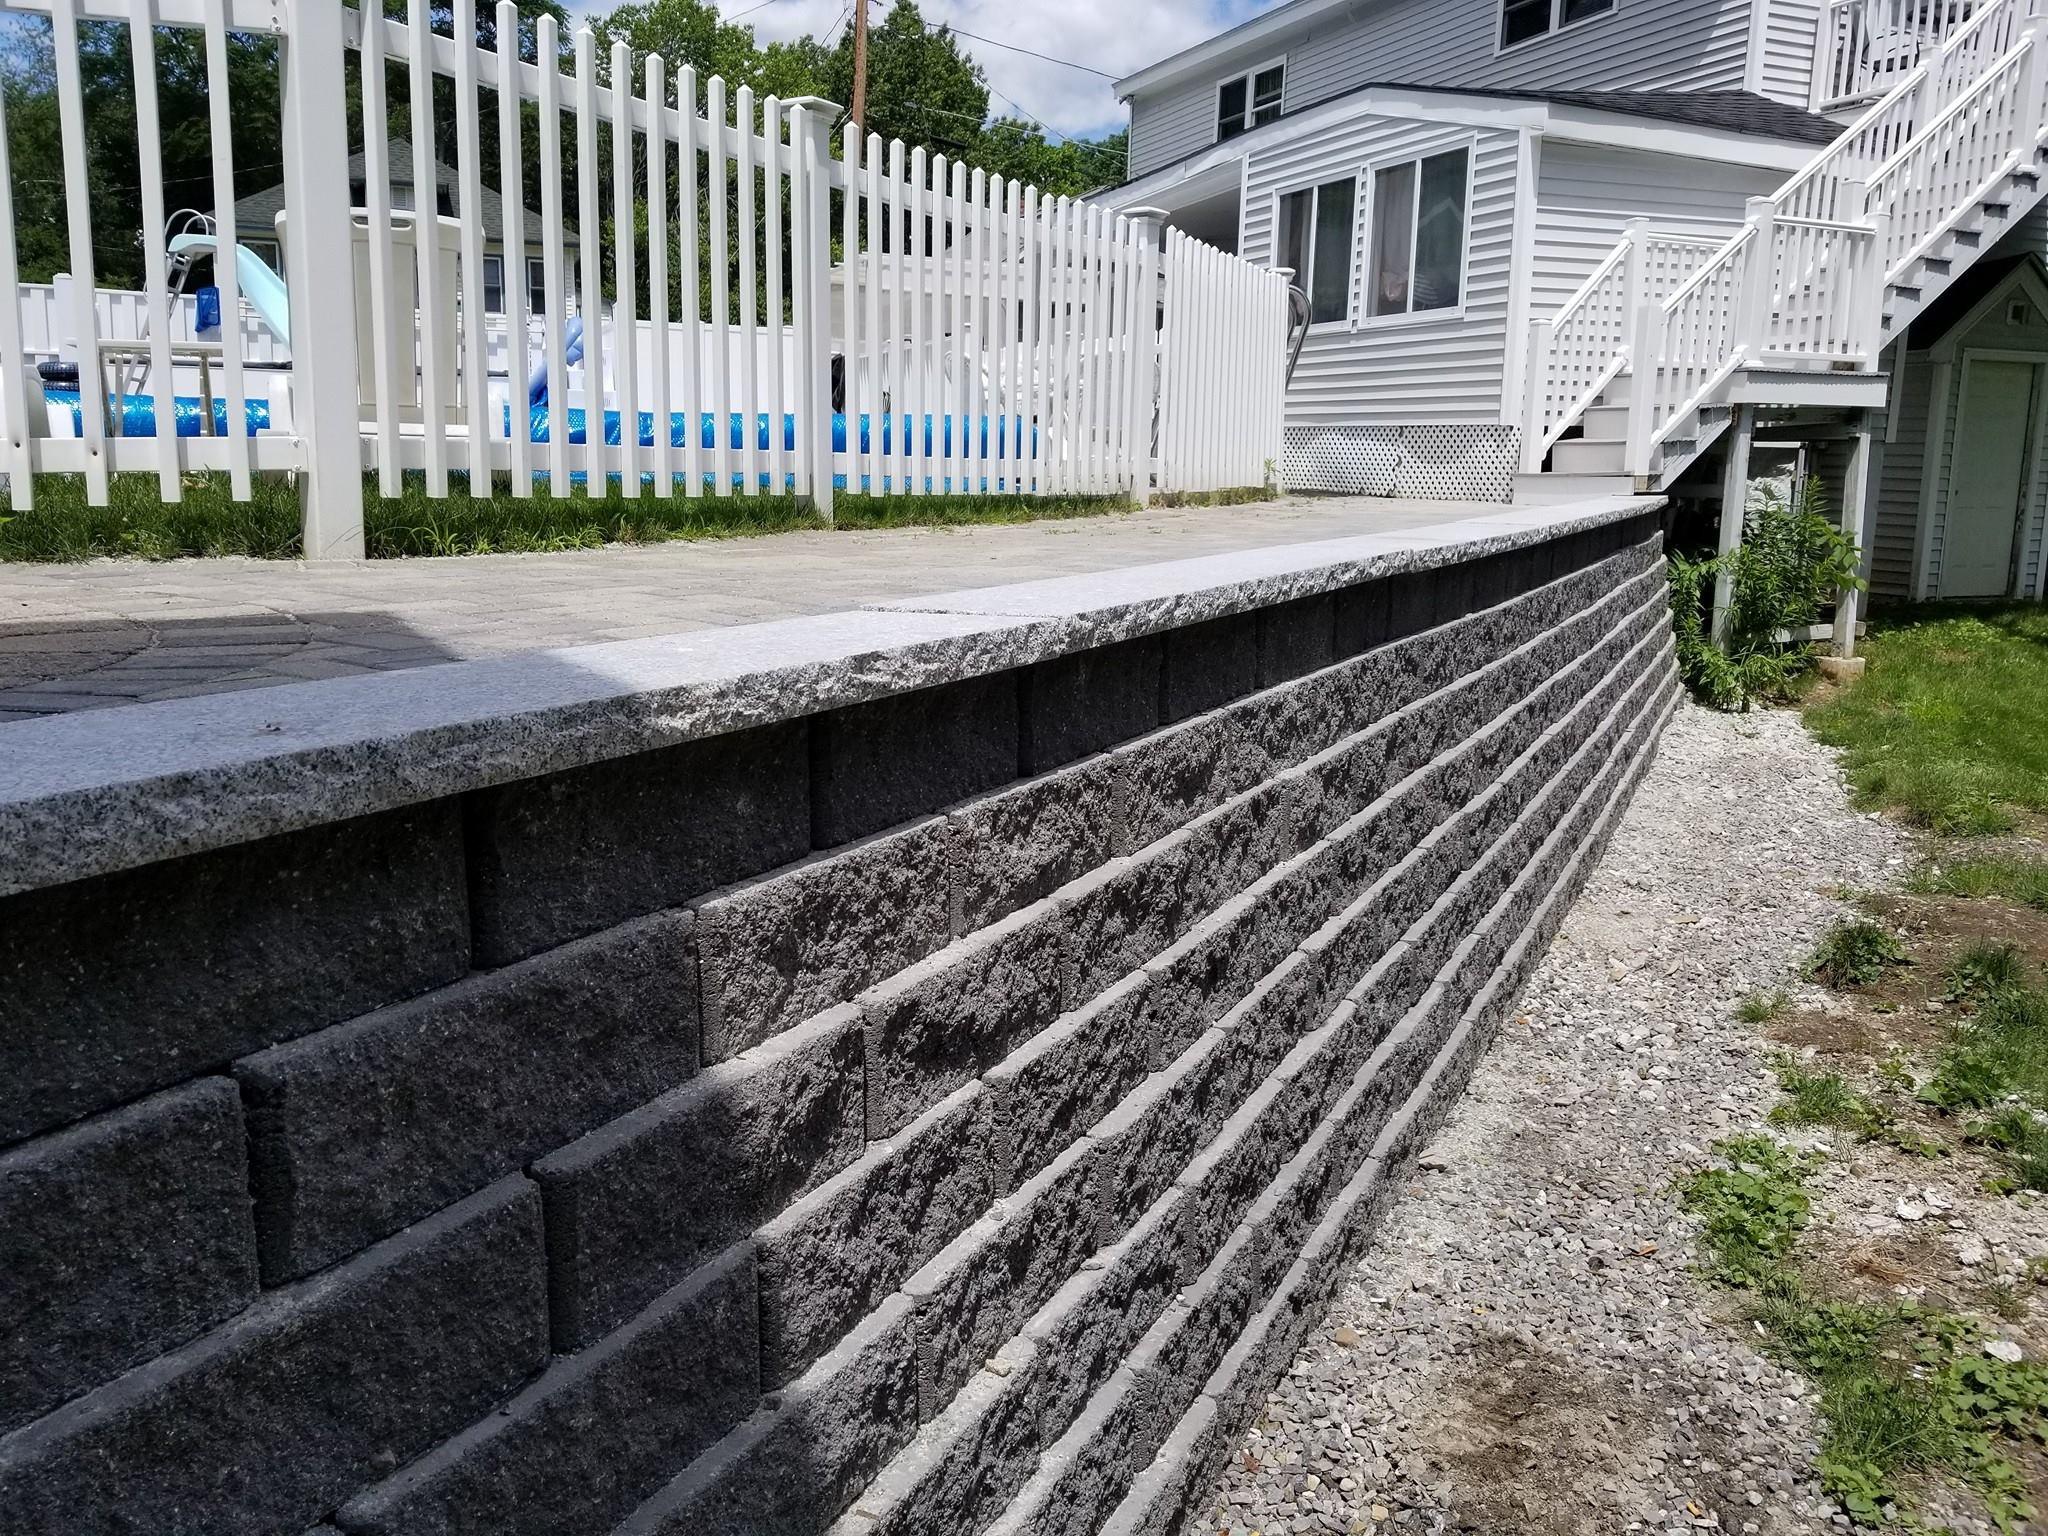 H&H Stoneworks & Home Improvement